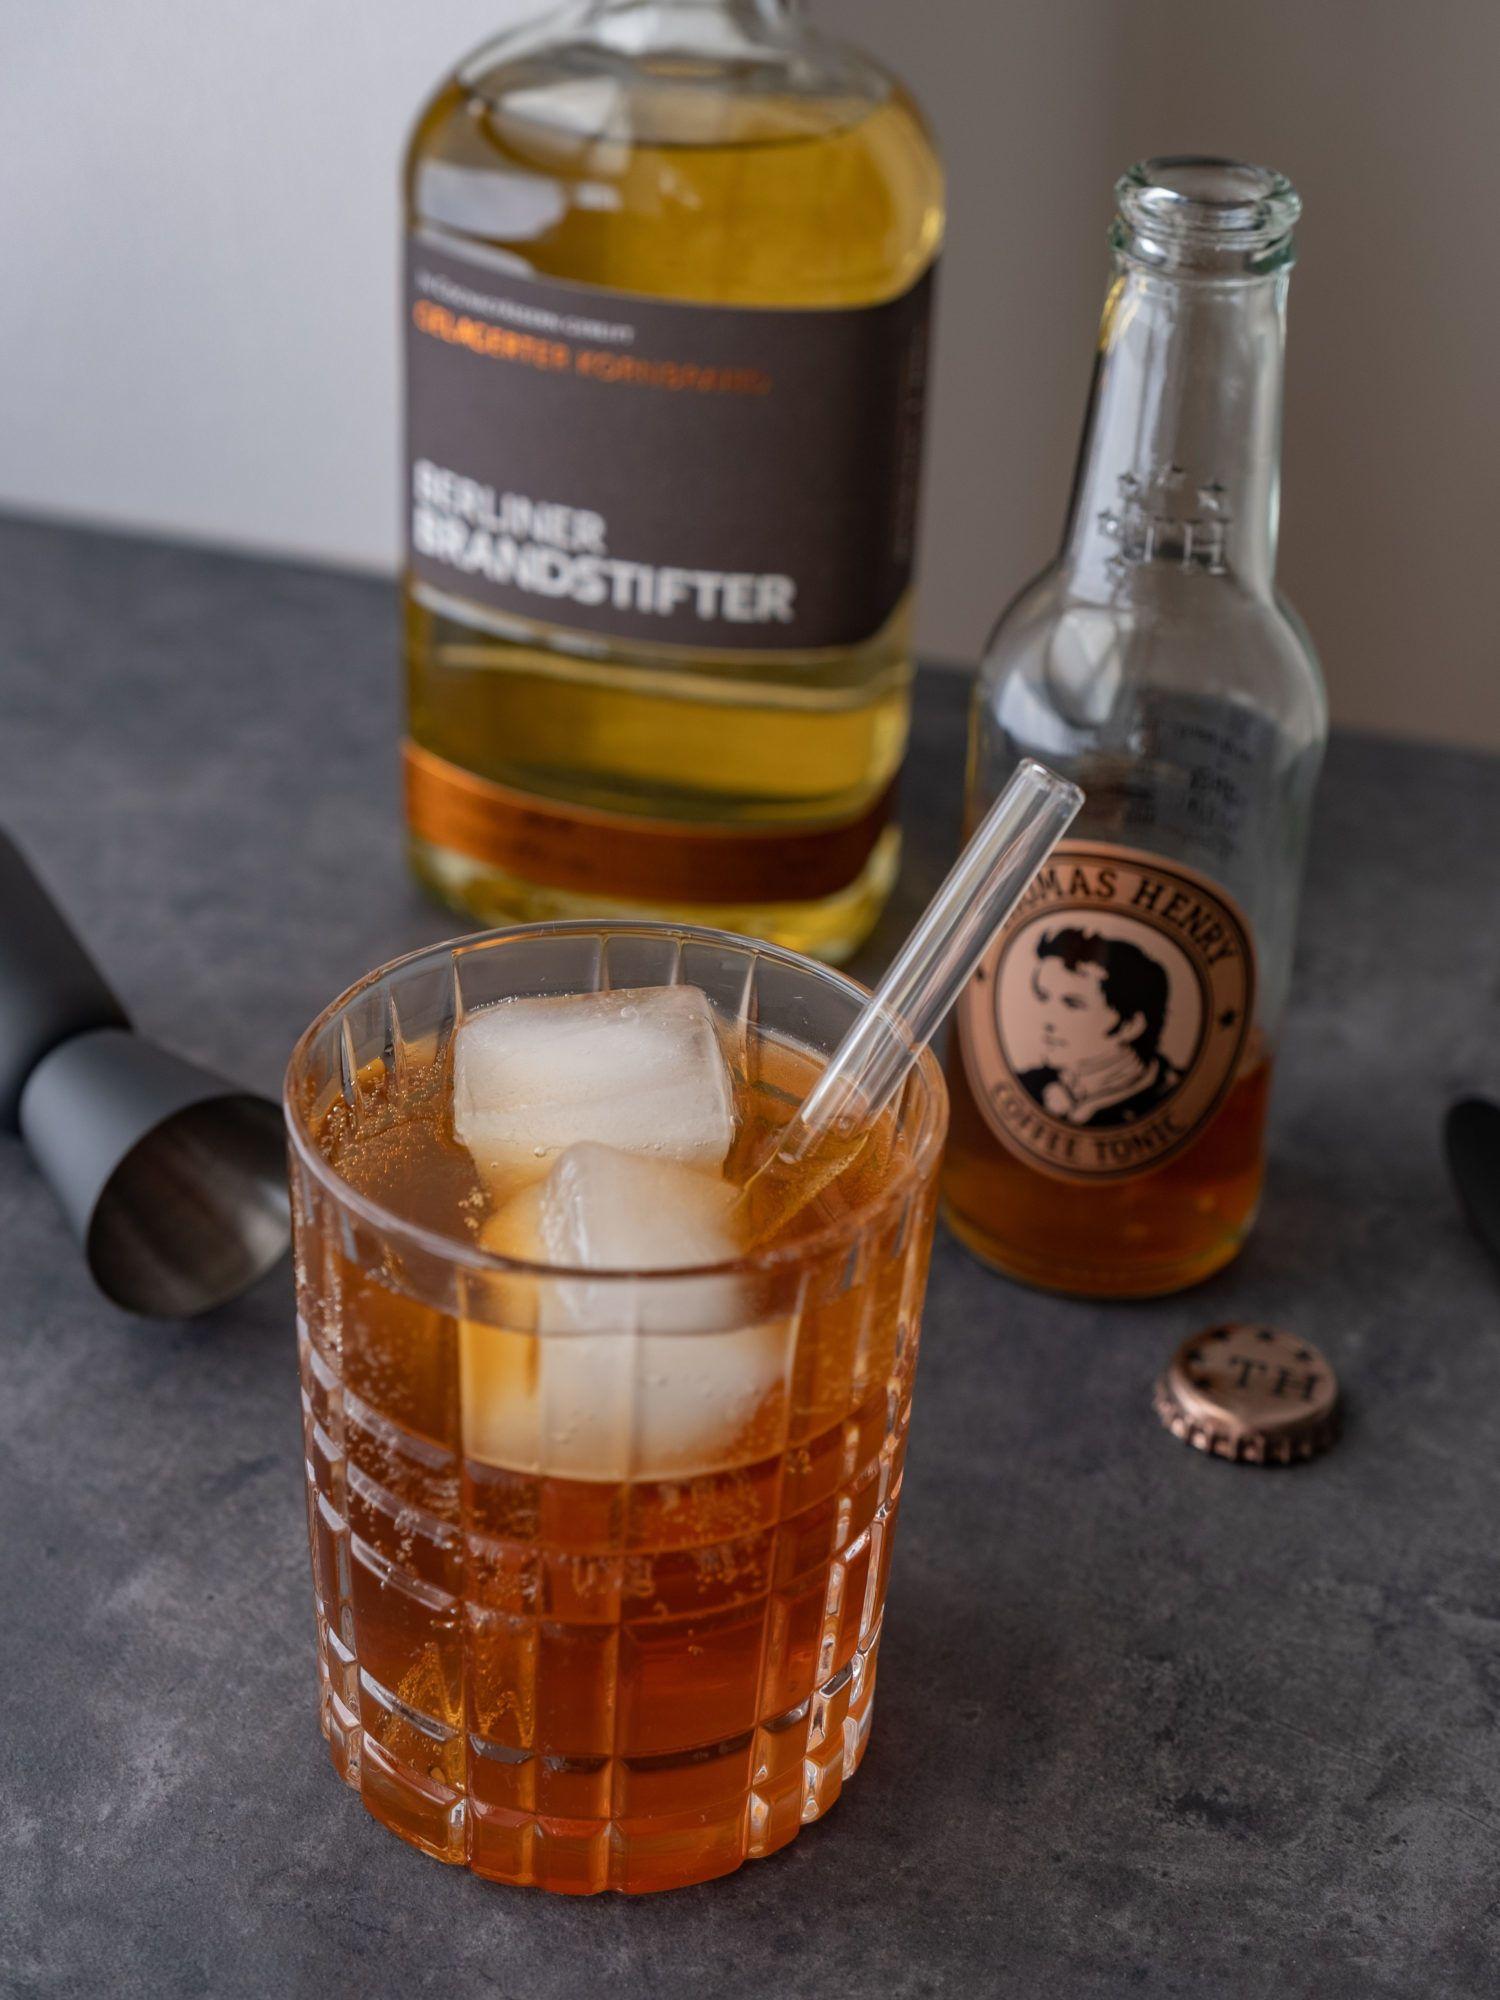 Foodblog, About Fuel, Brandstifter Coffee Tonic, Jigger, Kornbrand